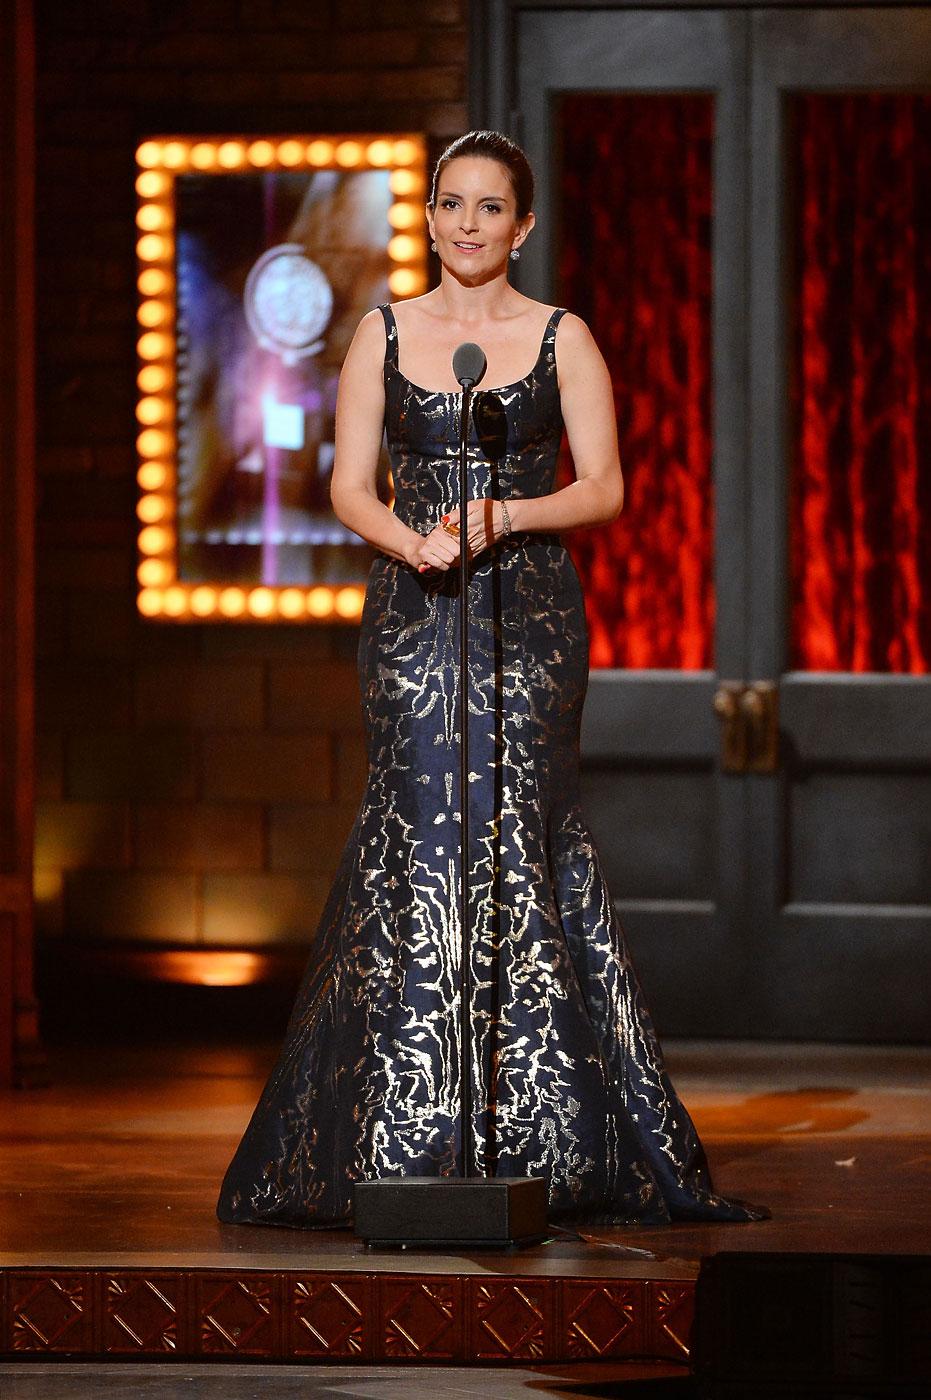 Tina Fey wears Oscar de la Renta during the 68th Annual Tony Awards at Radio City Music Hall on June 8, 2014 in New York City.